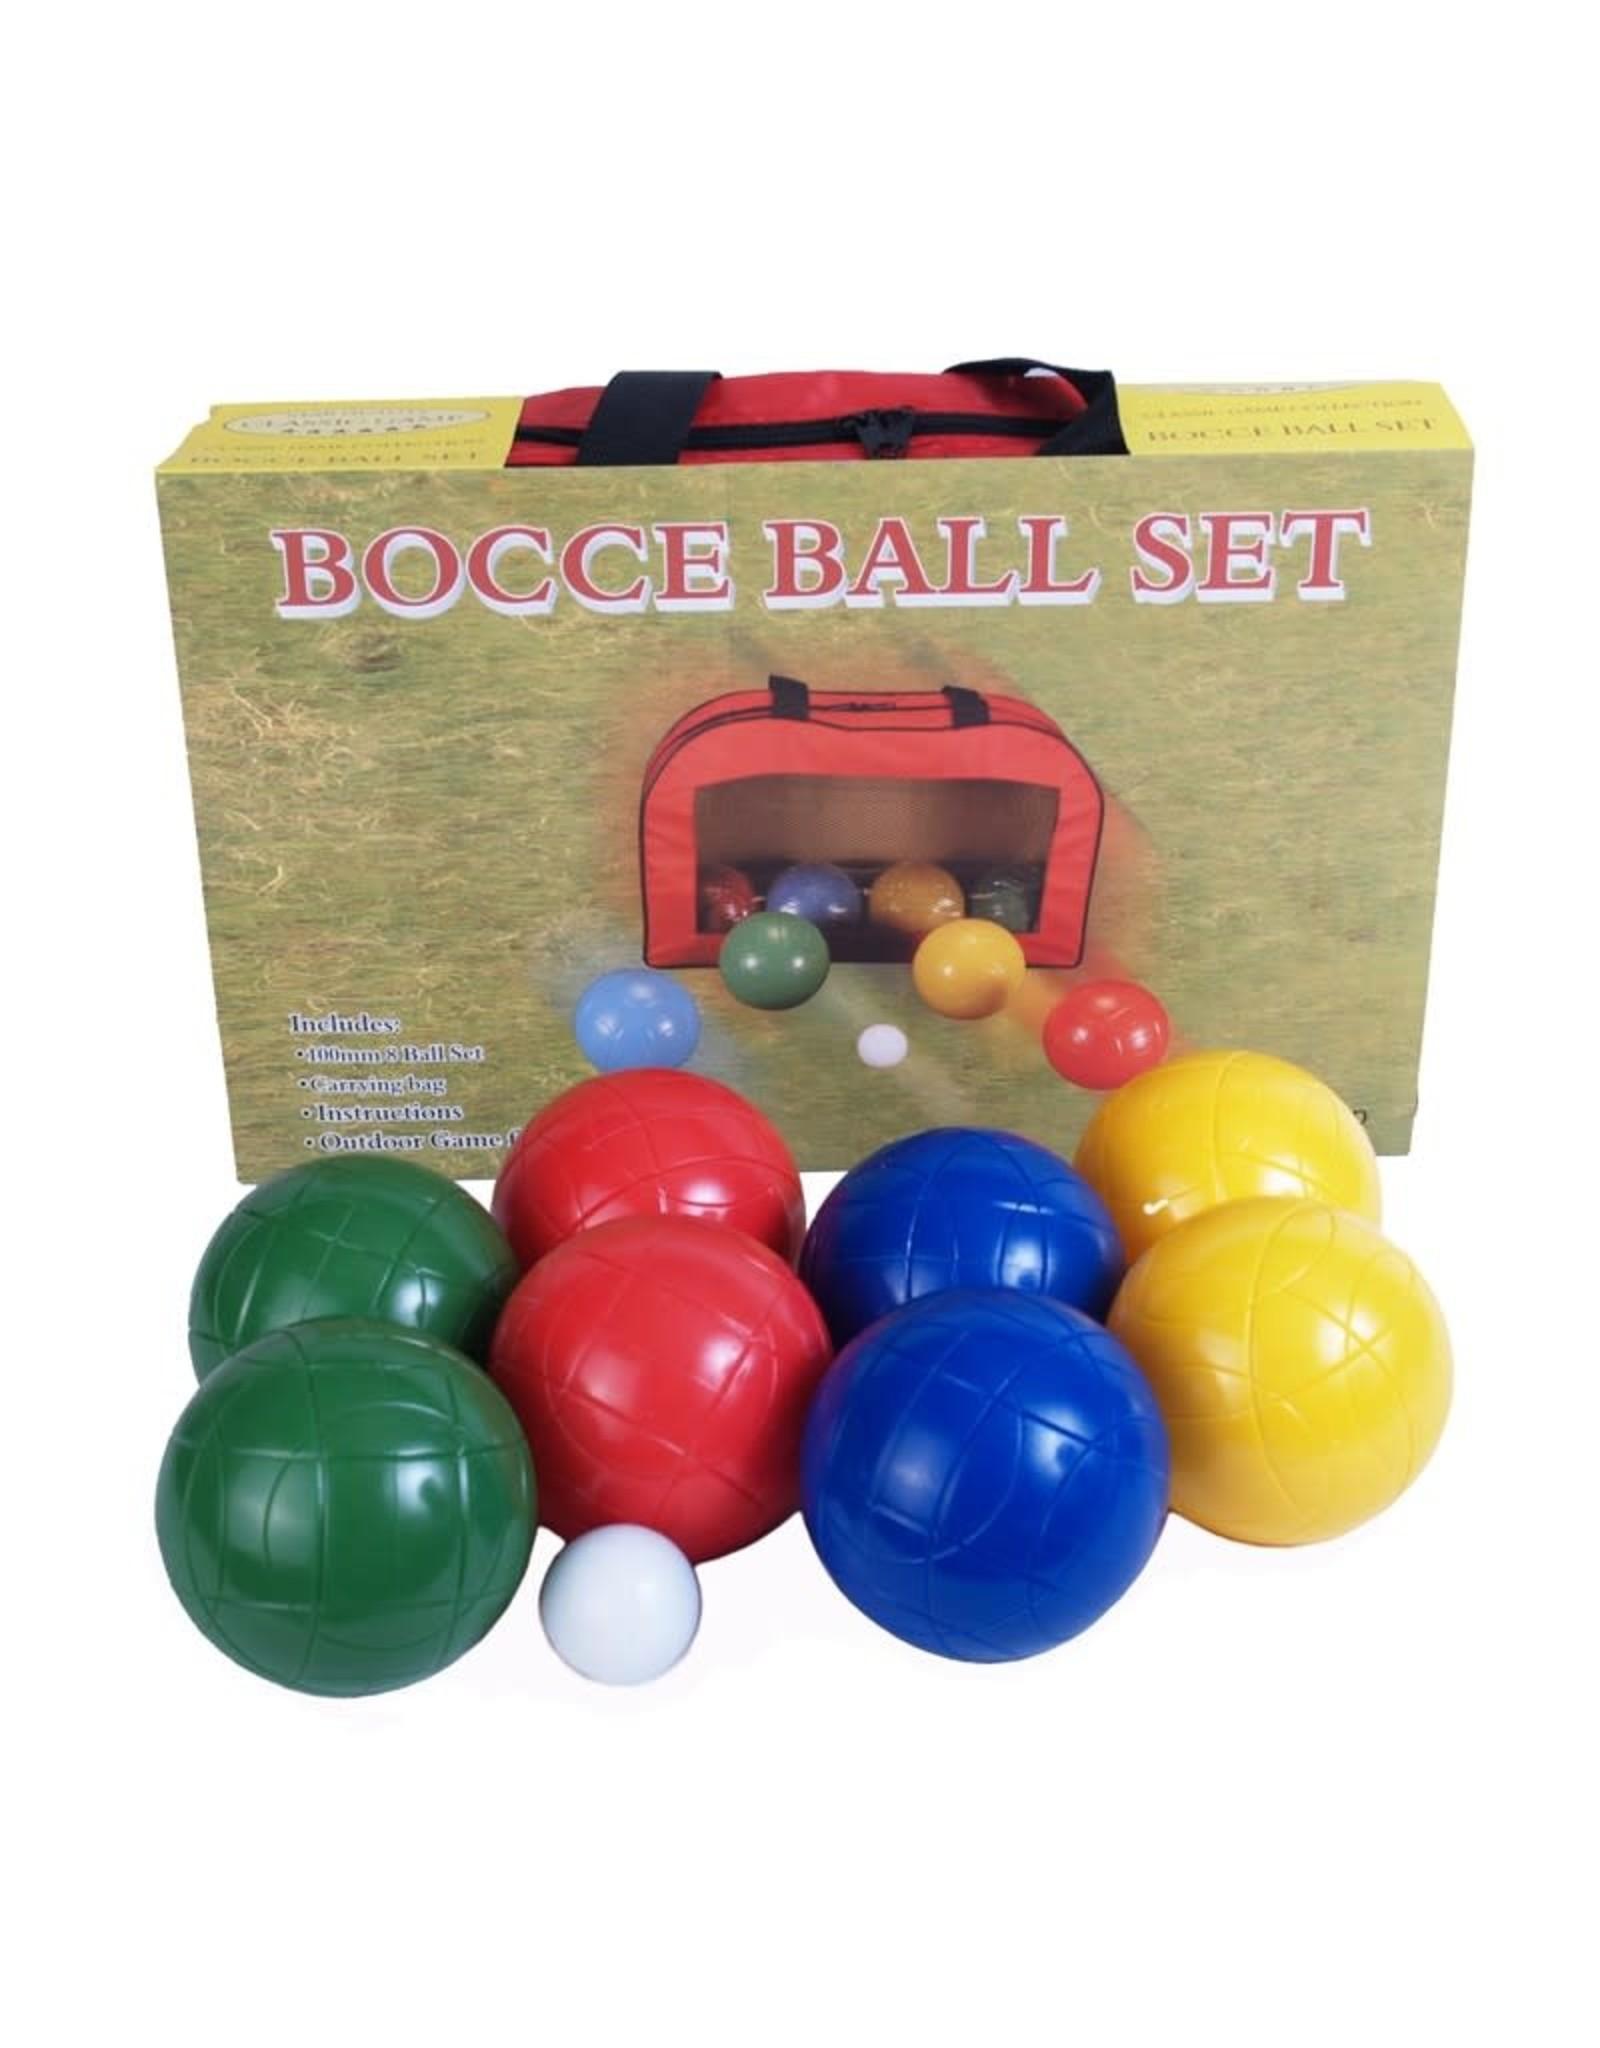 John Hansen Bocce Ball Set